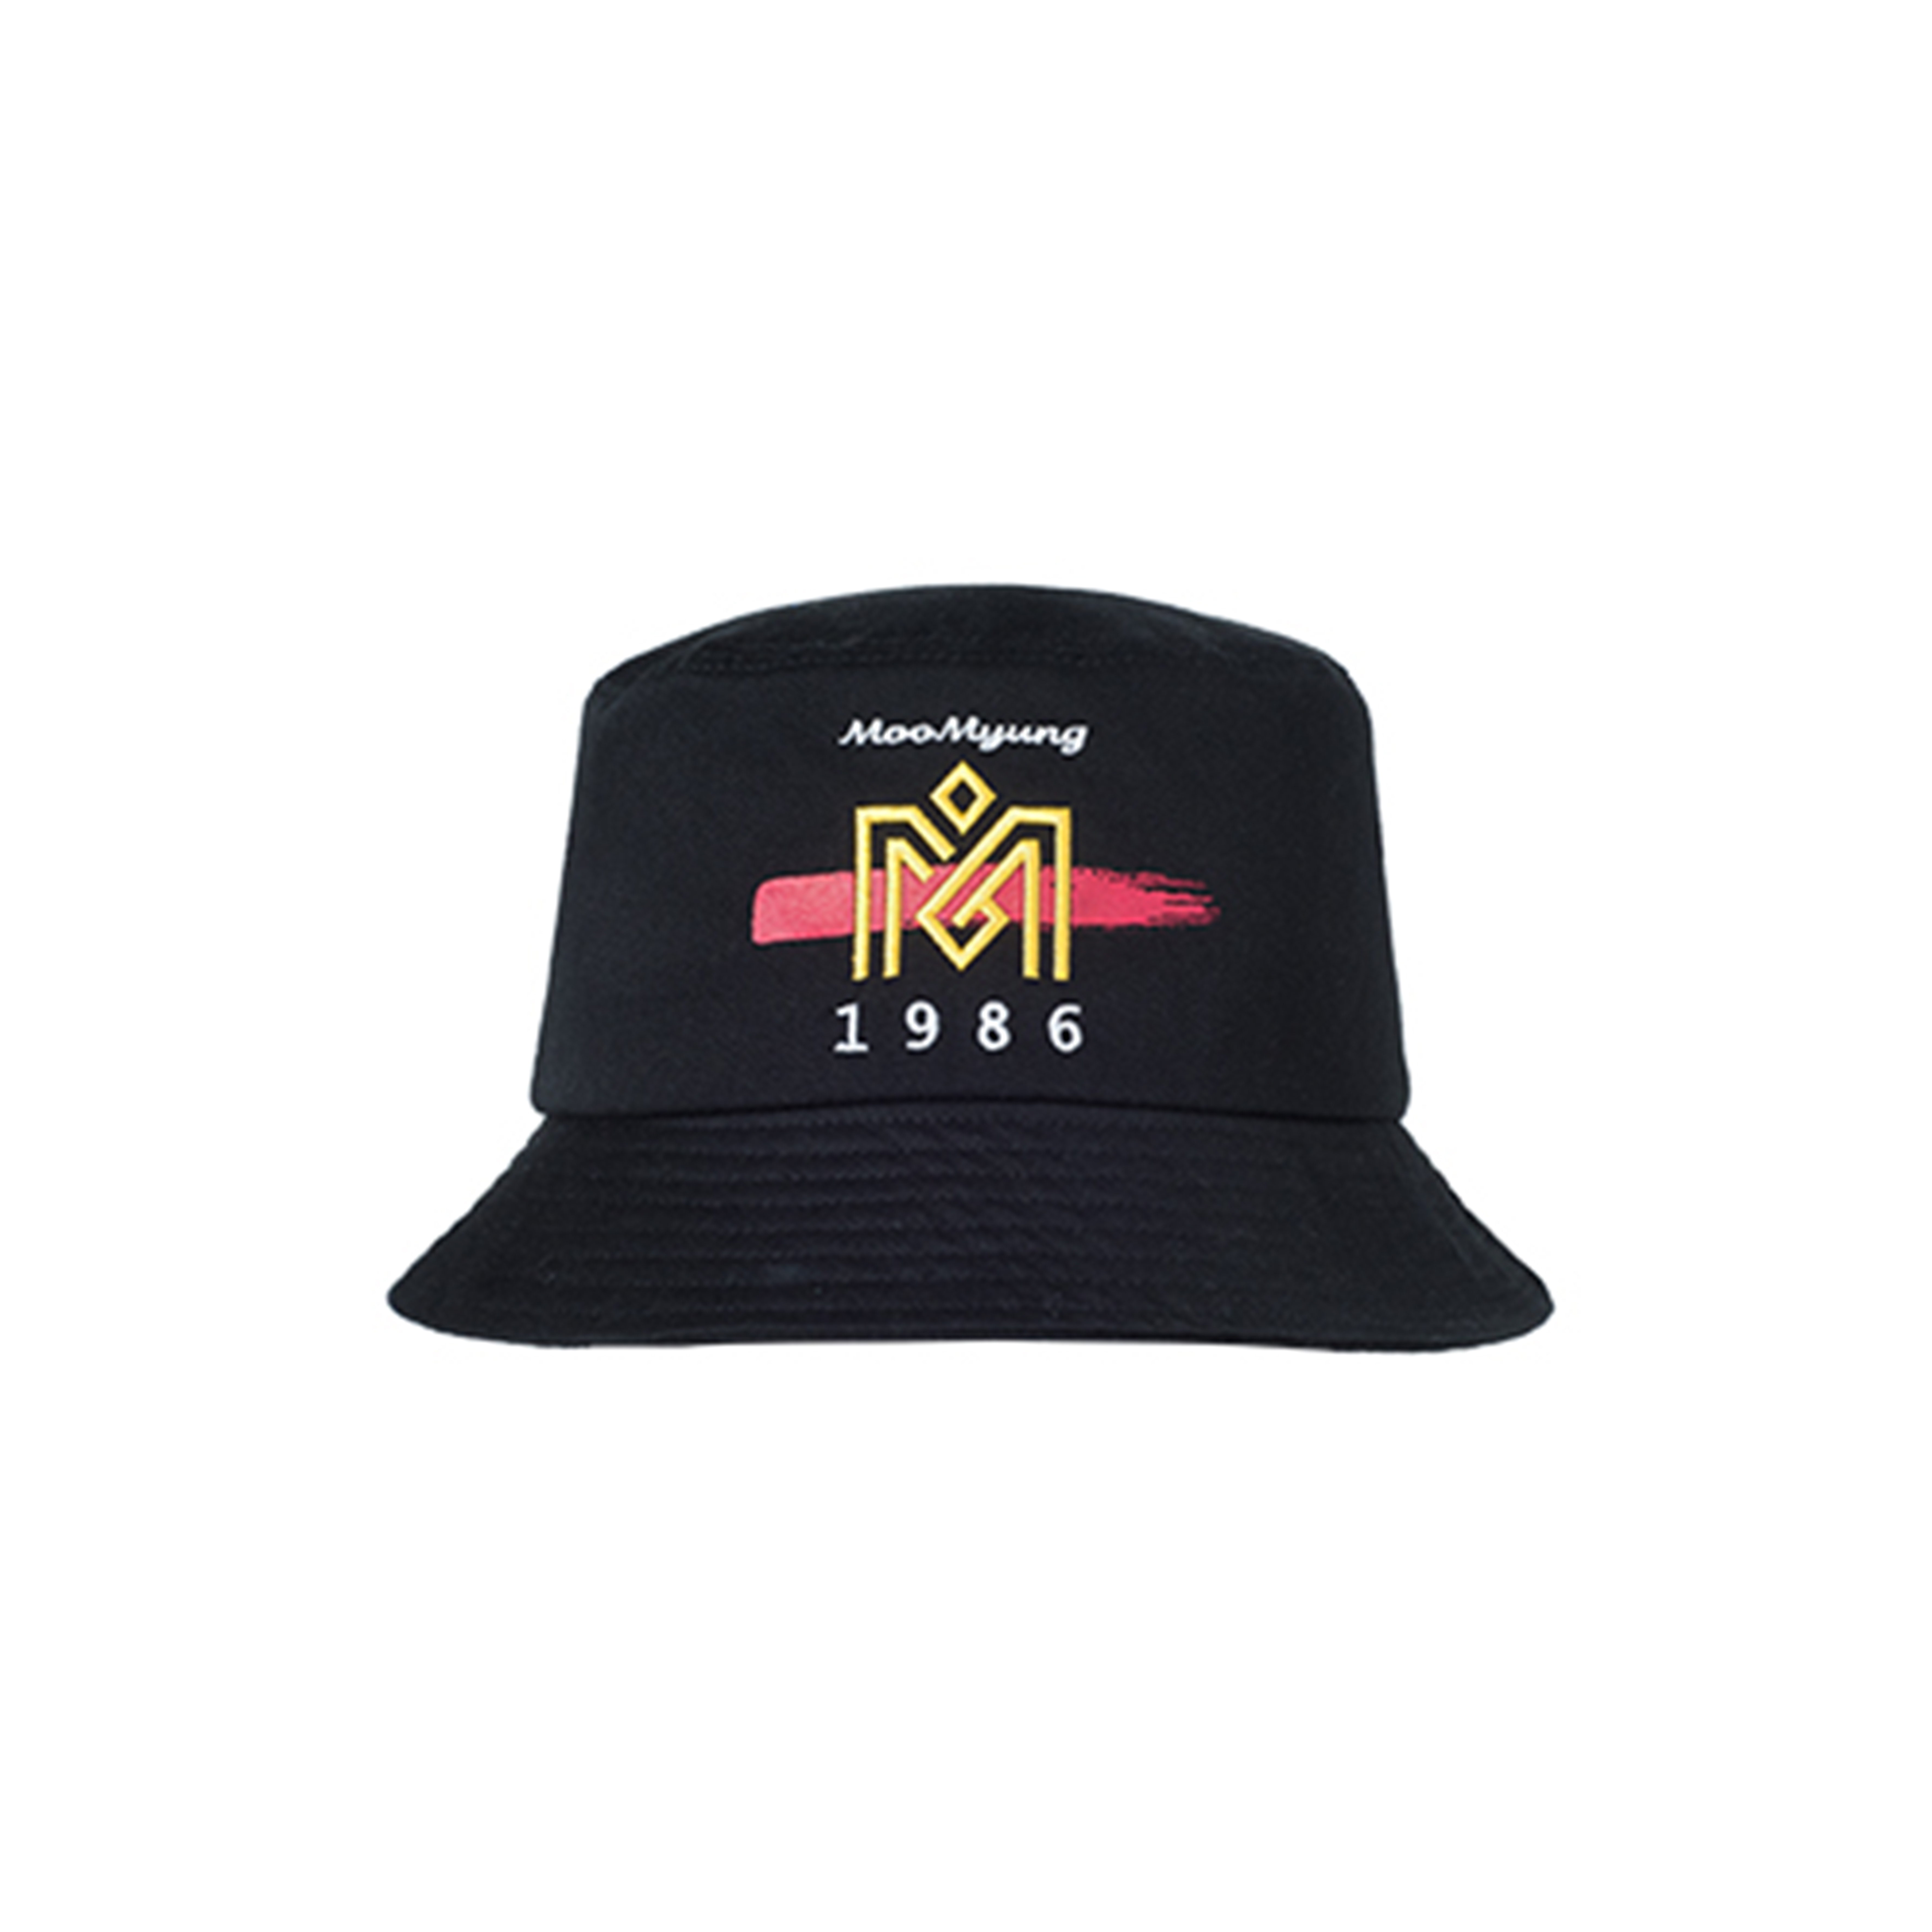 M.O.M.G BRUSH LOGO BUCKET HAT / BLACK